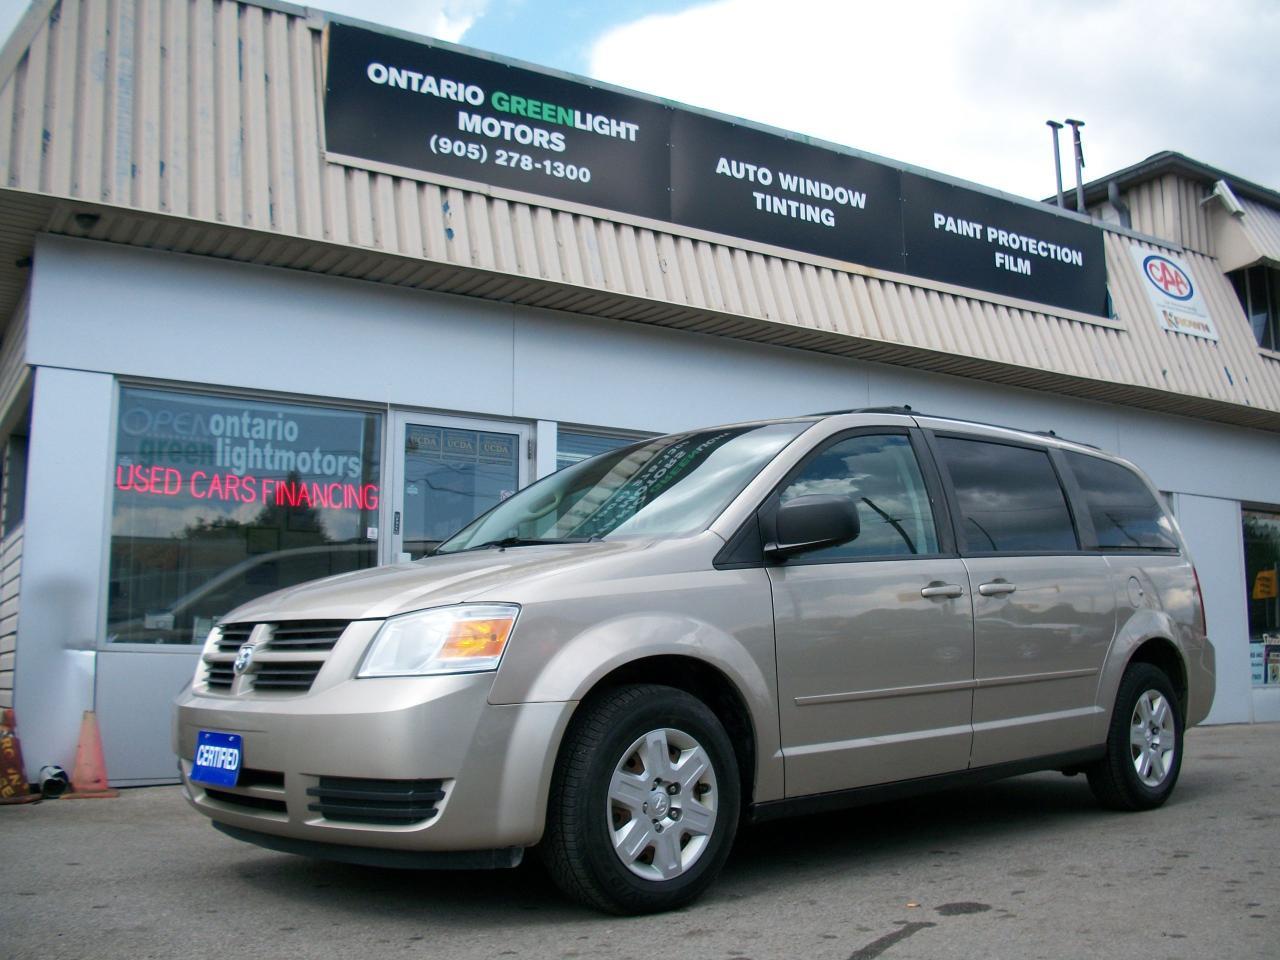 2008 Dodge Grand Caravan 7 PASSENGERS FULL STOW AND GO